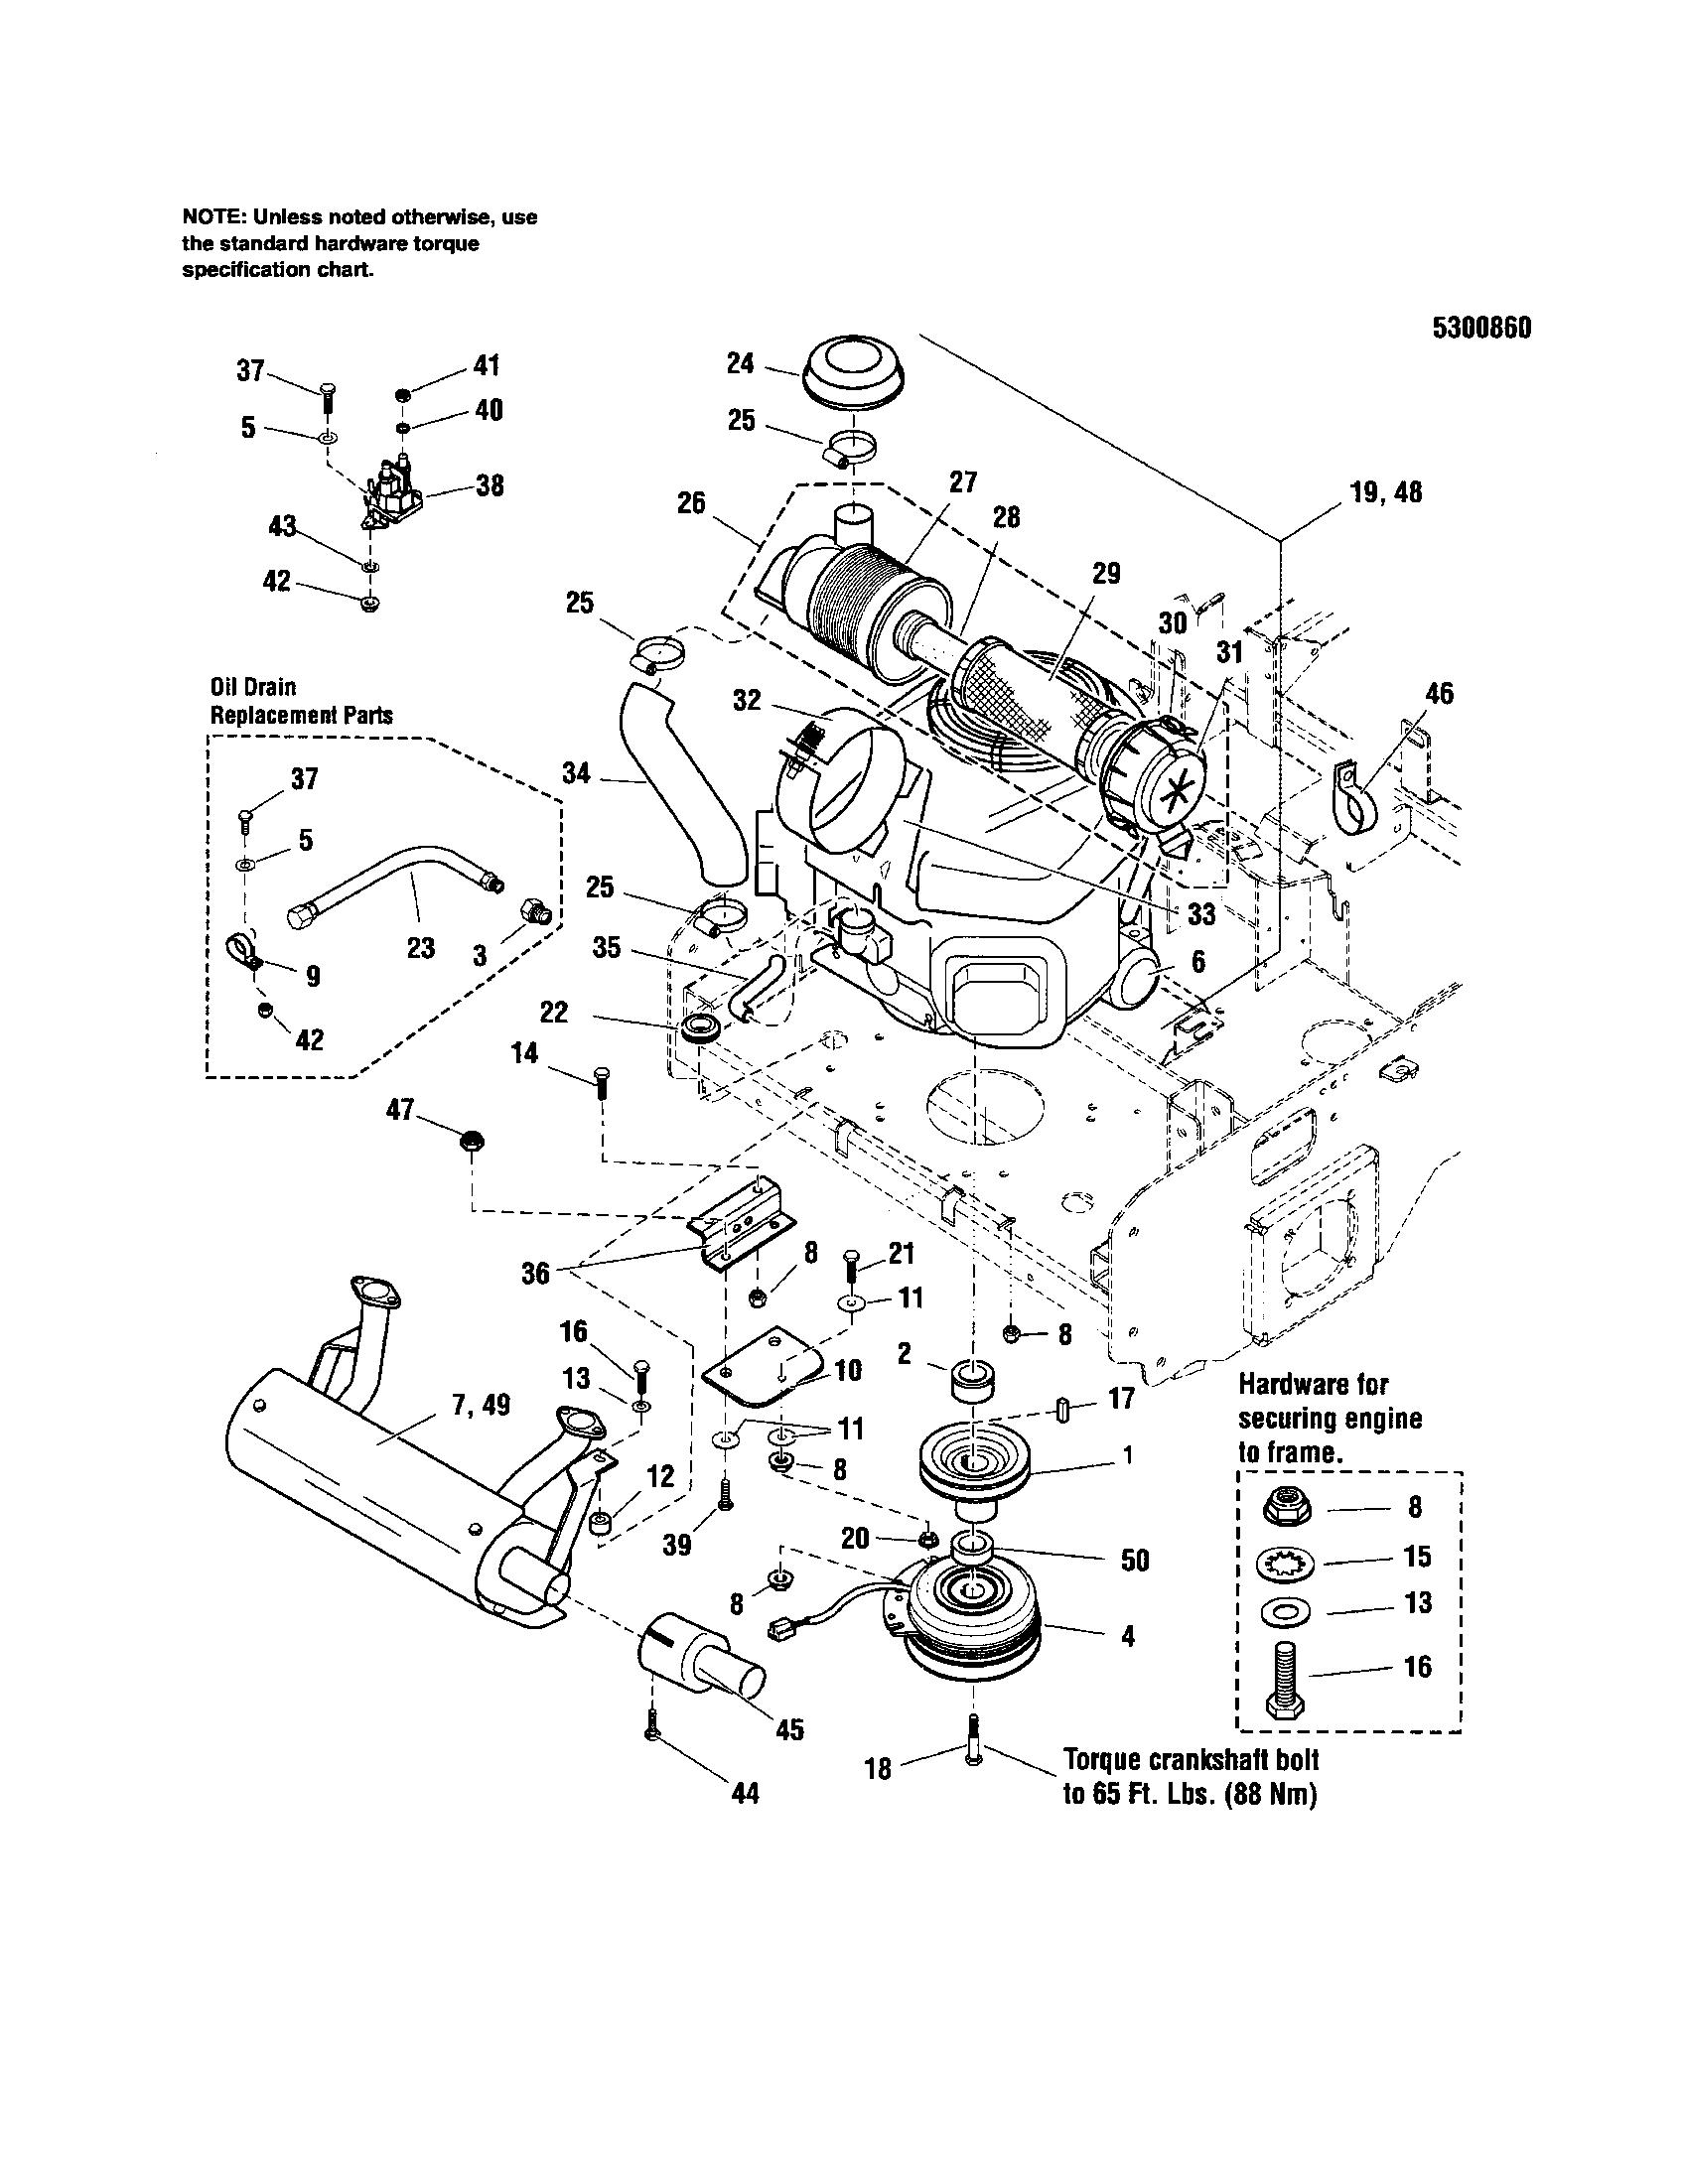 NM_5930] Kawasaki Fc420V Carburetor Parts Diagram Schematic WiringHete Pead Clesi Ogram Ropye Rele Mohammedshrine Librar Wiring 101